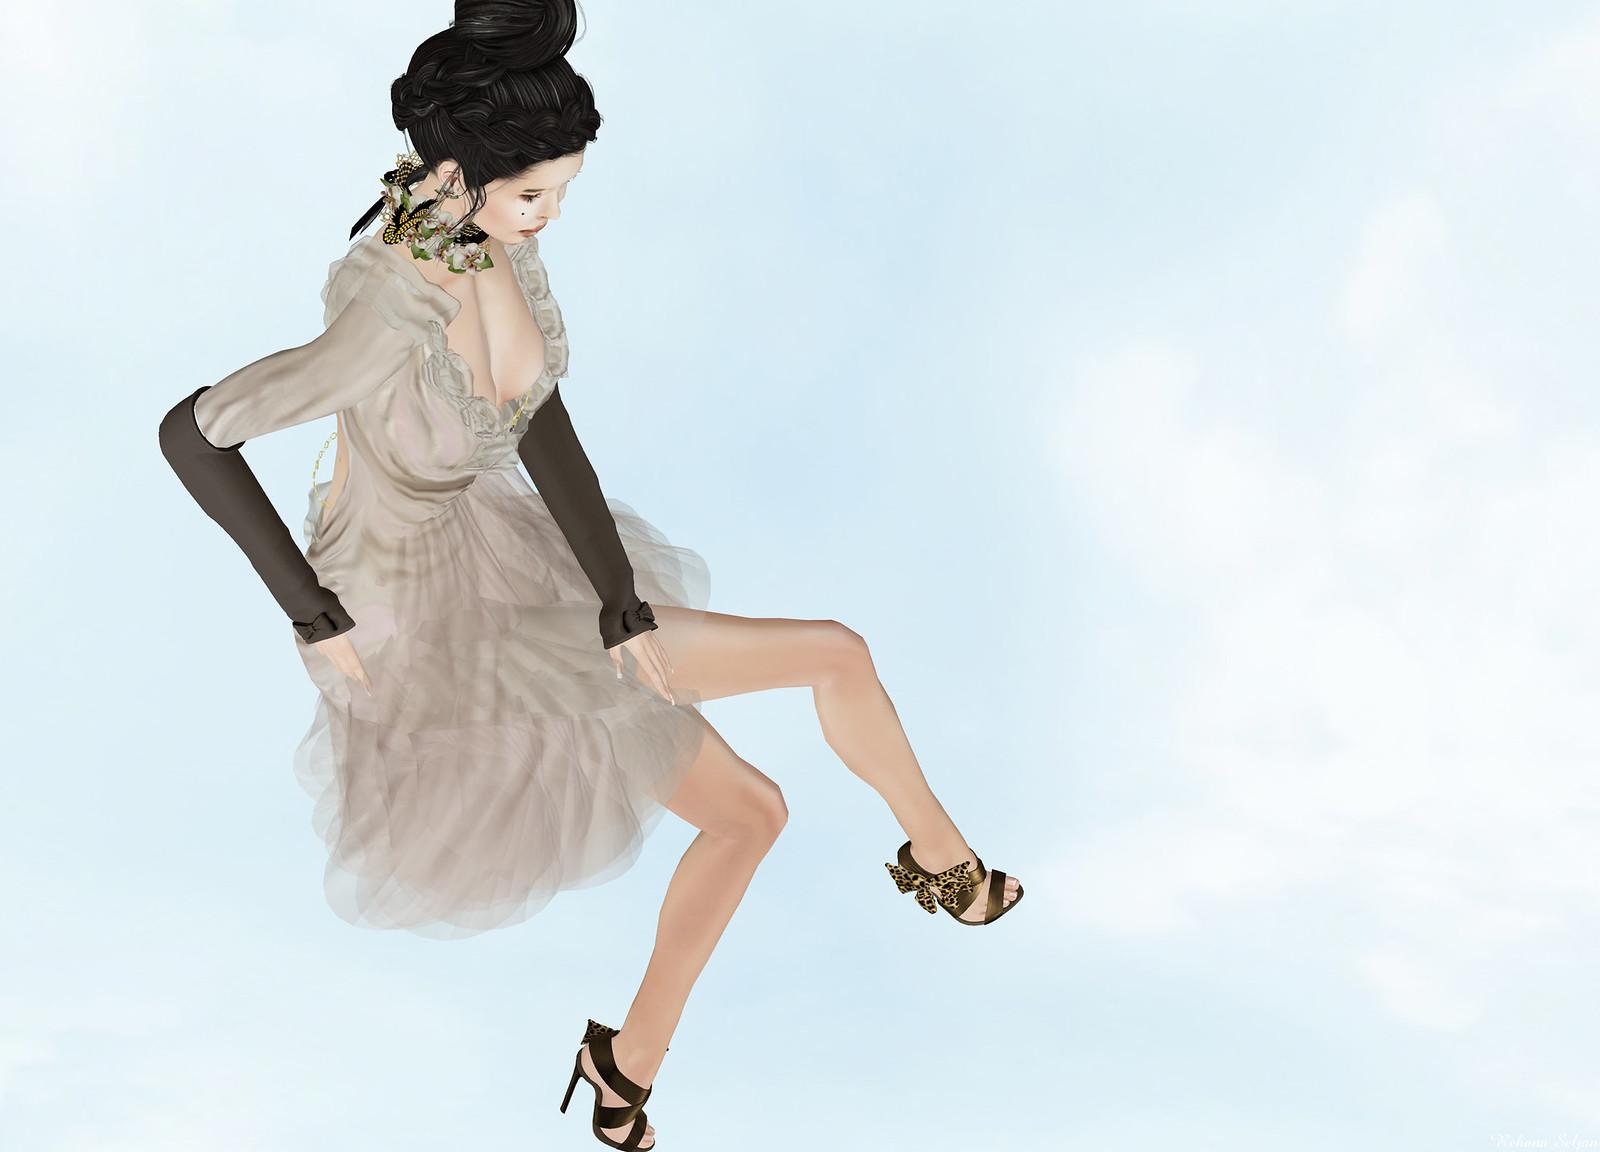 RAYNE - Cherish @Black Tie